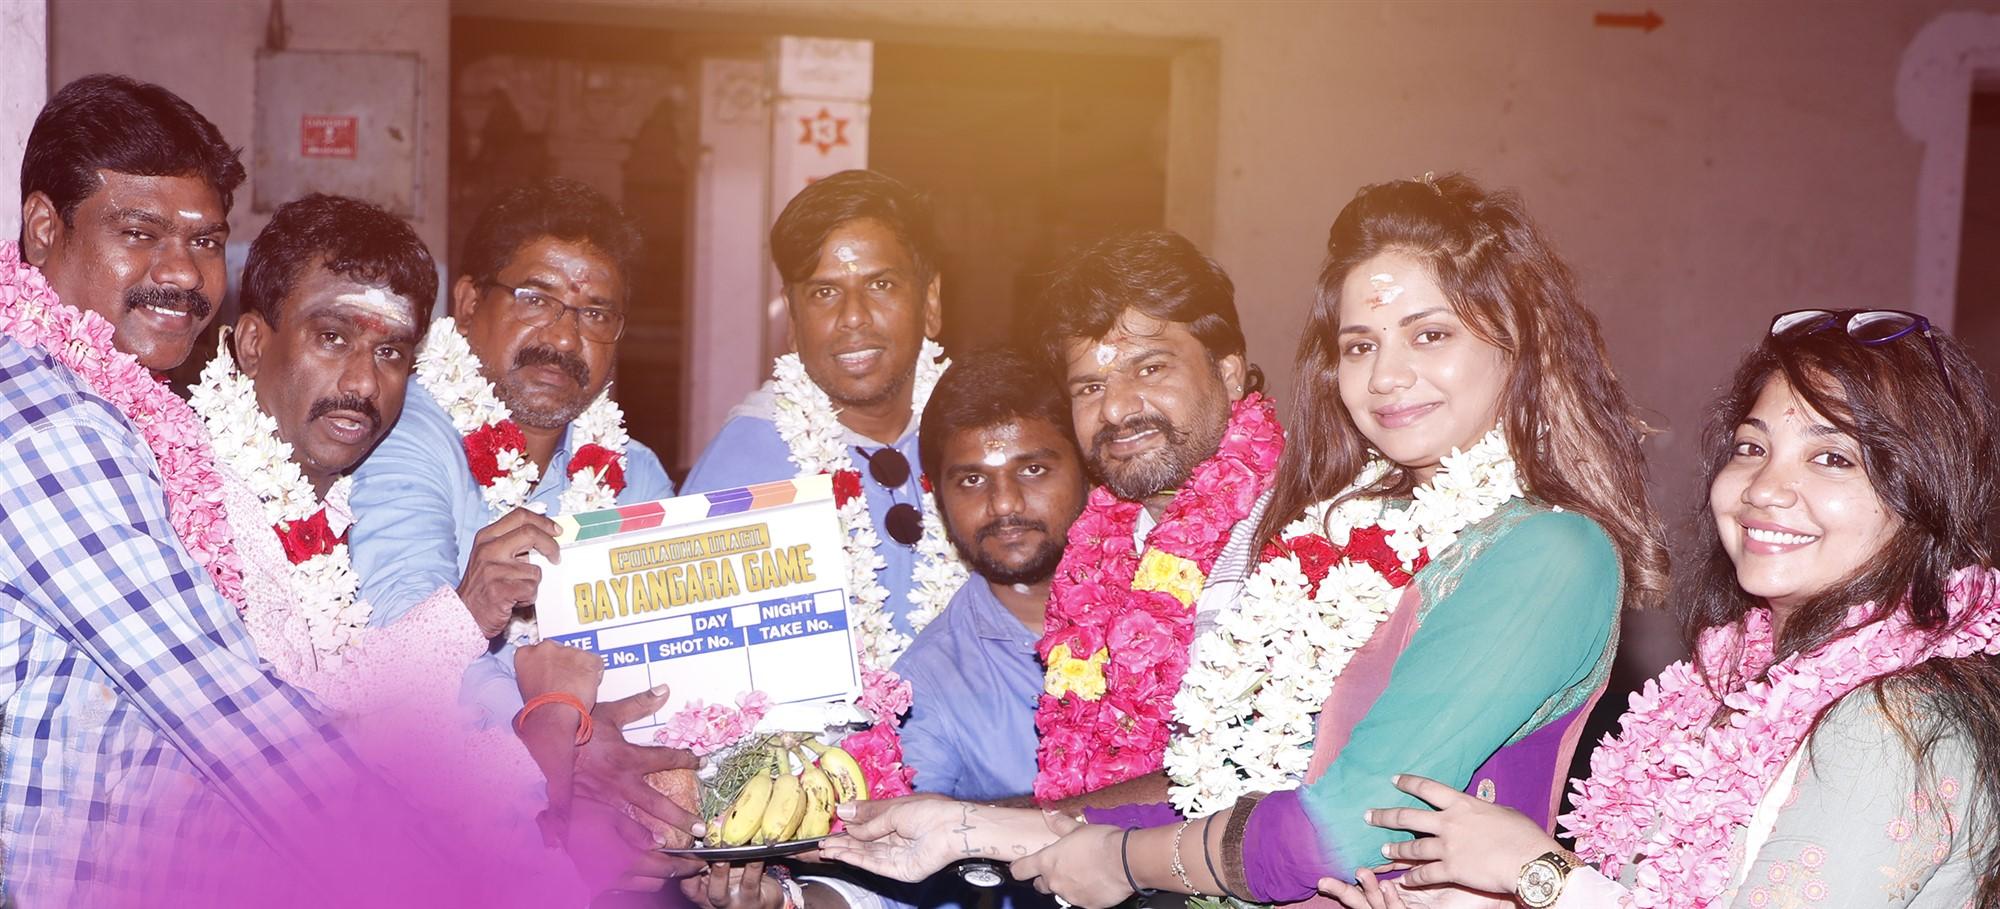 Polladha Ulagil Bayangara Game PubG Tamil Movie Pooja Stills